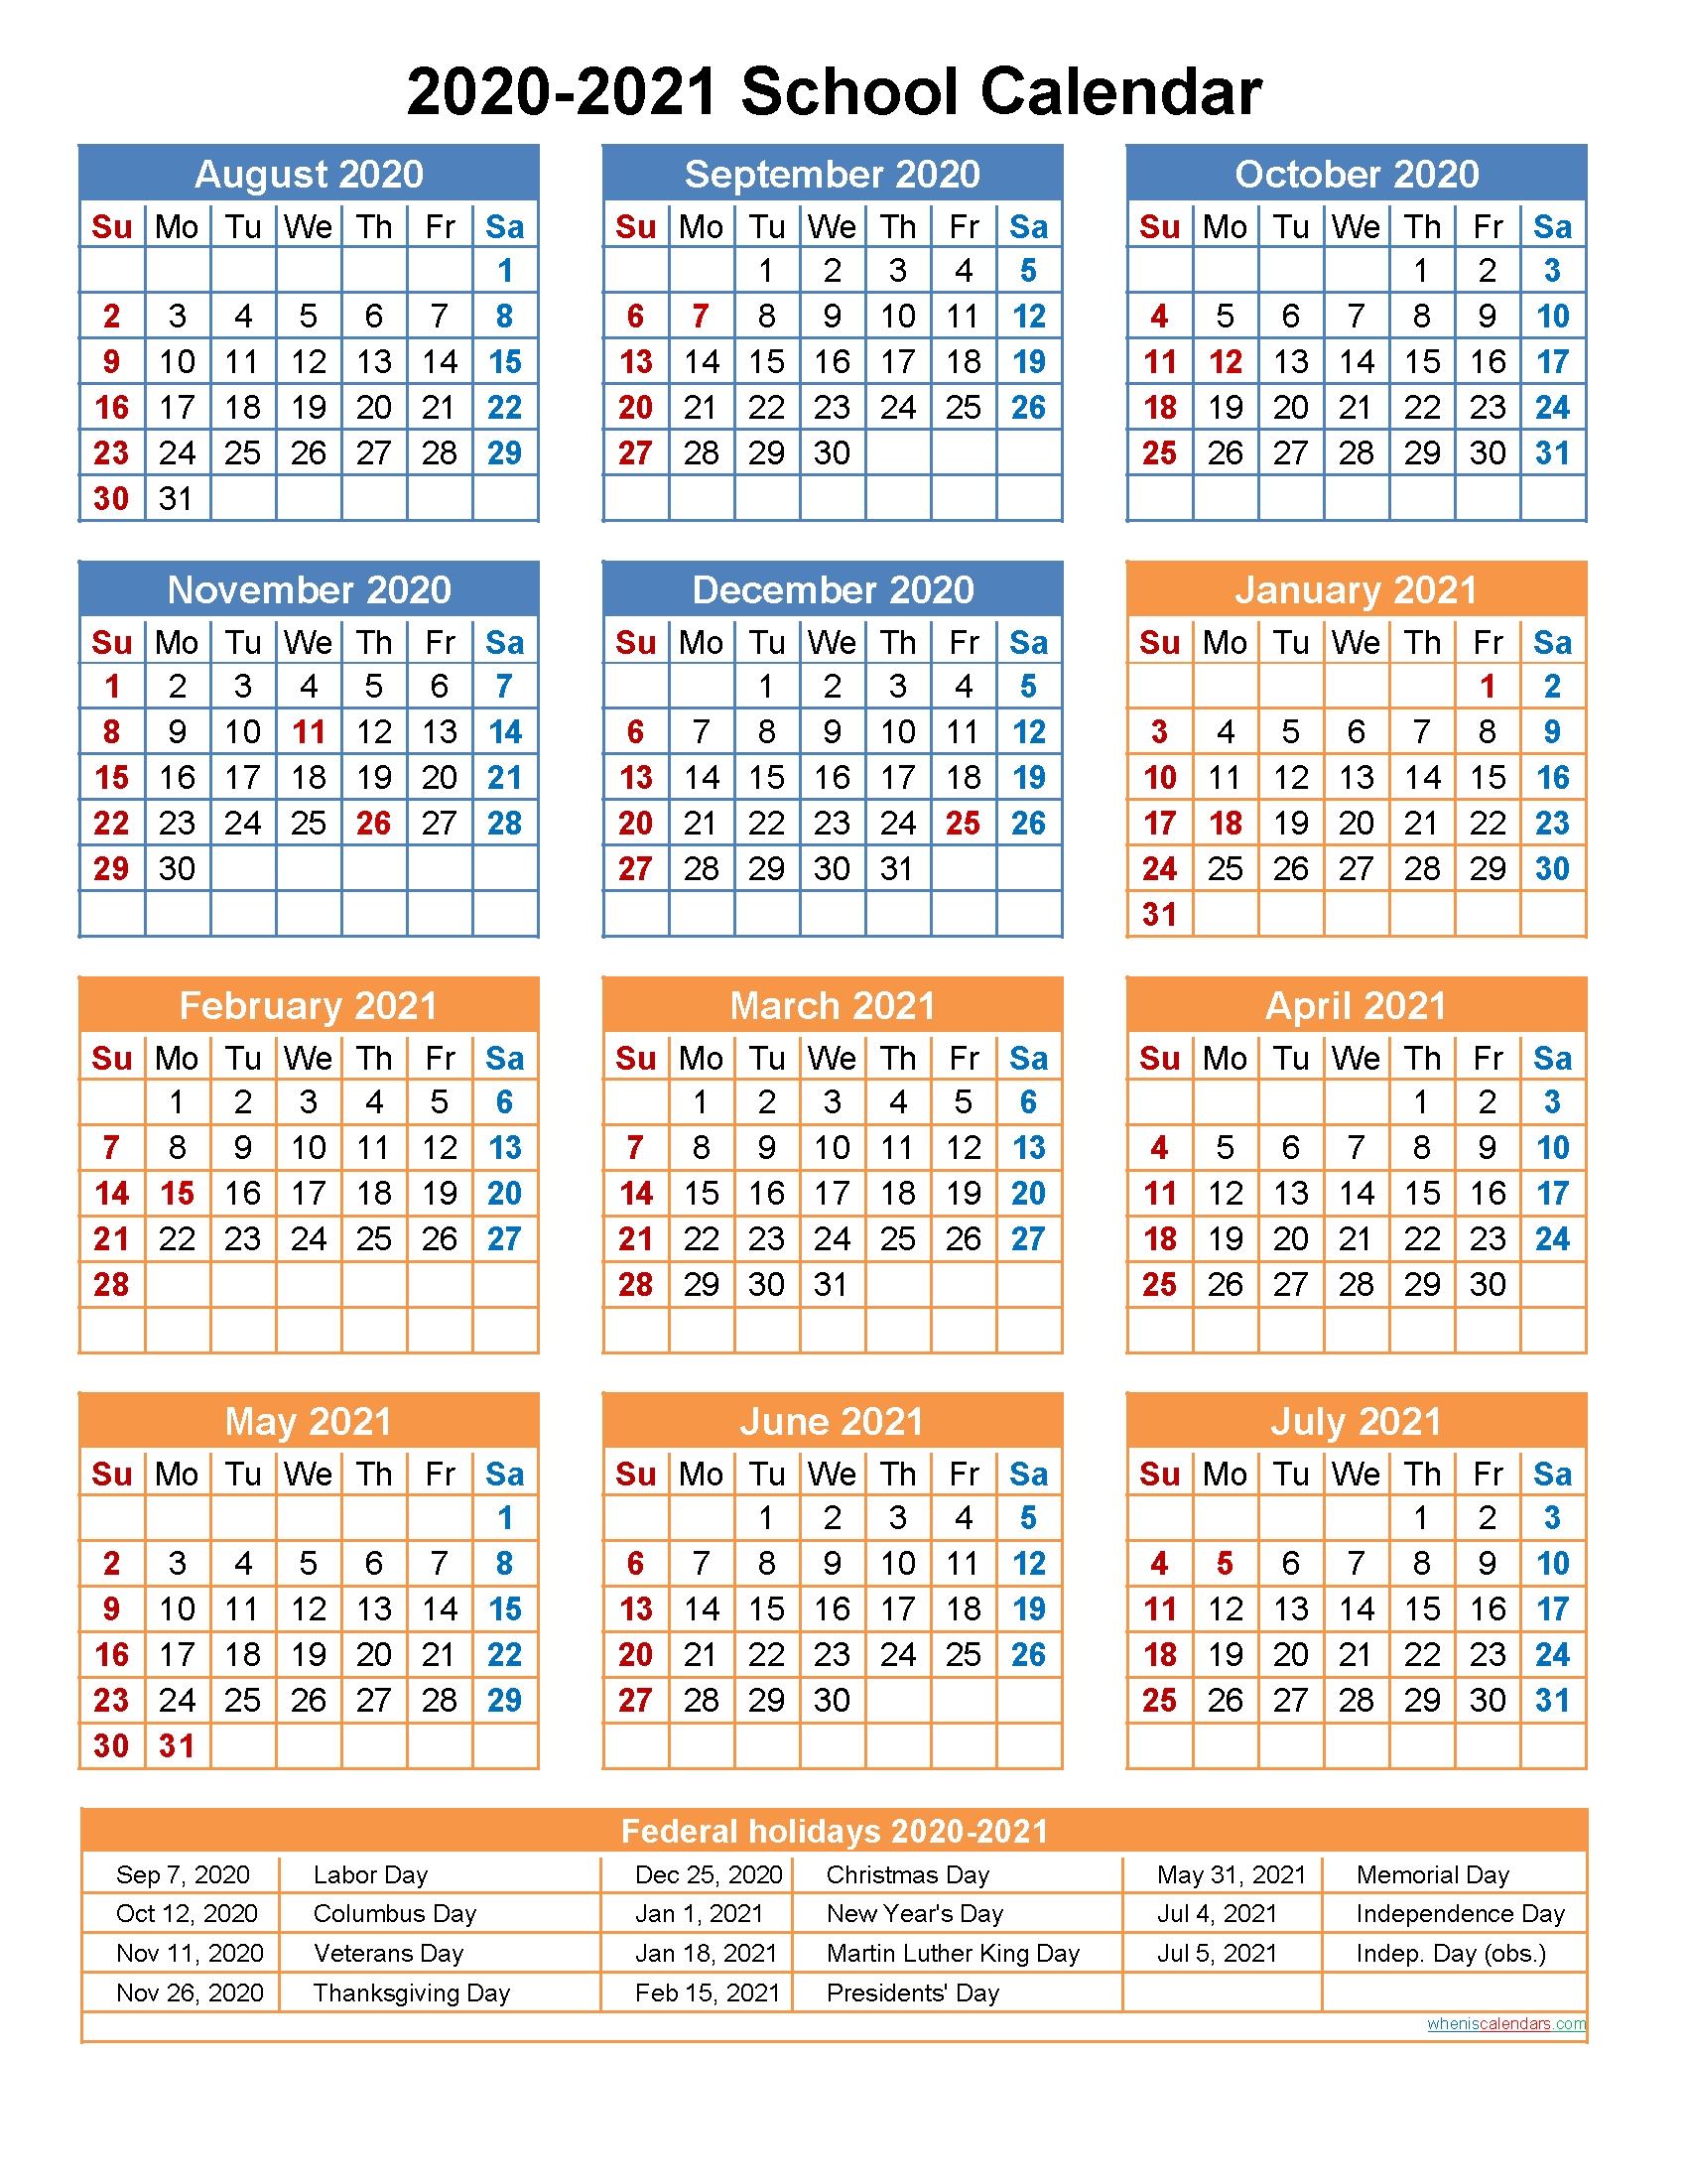 2020 And 2021 School Calendar Printable (Portrait)- Template